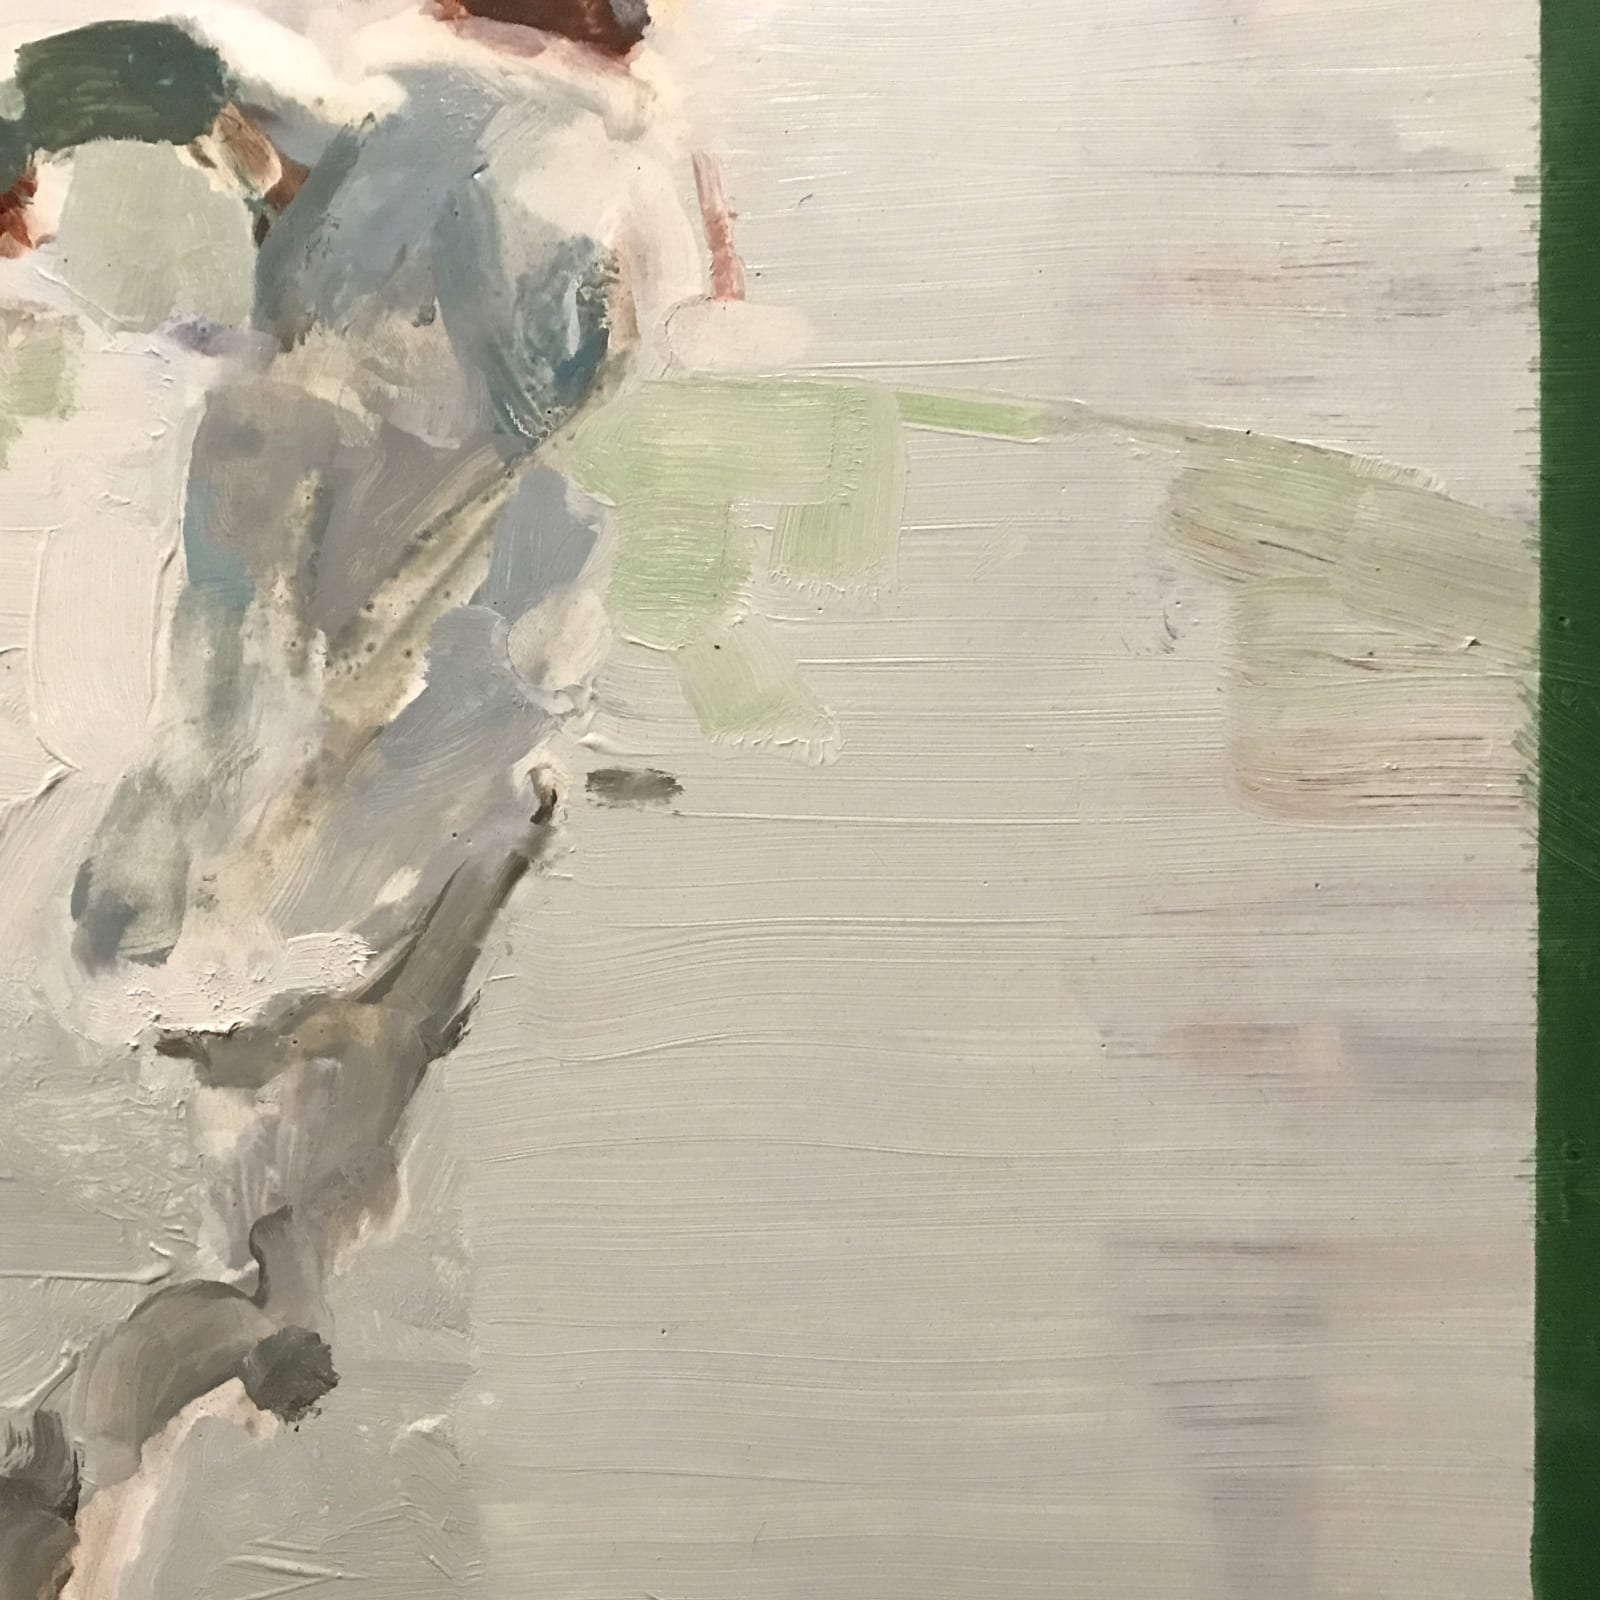 Conor Foy  Boundary  Oil on birch panel  41 x 61 cm